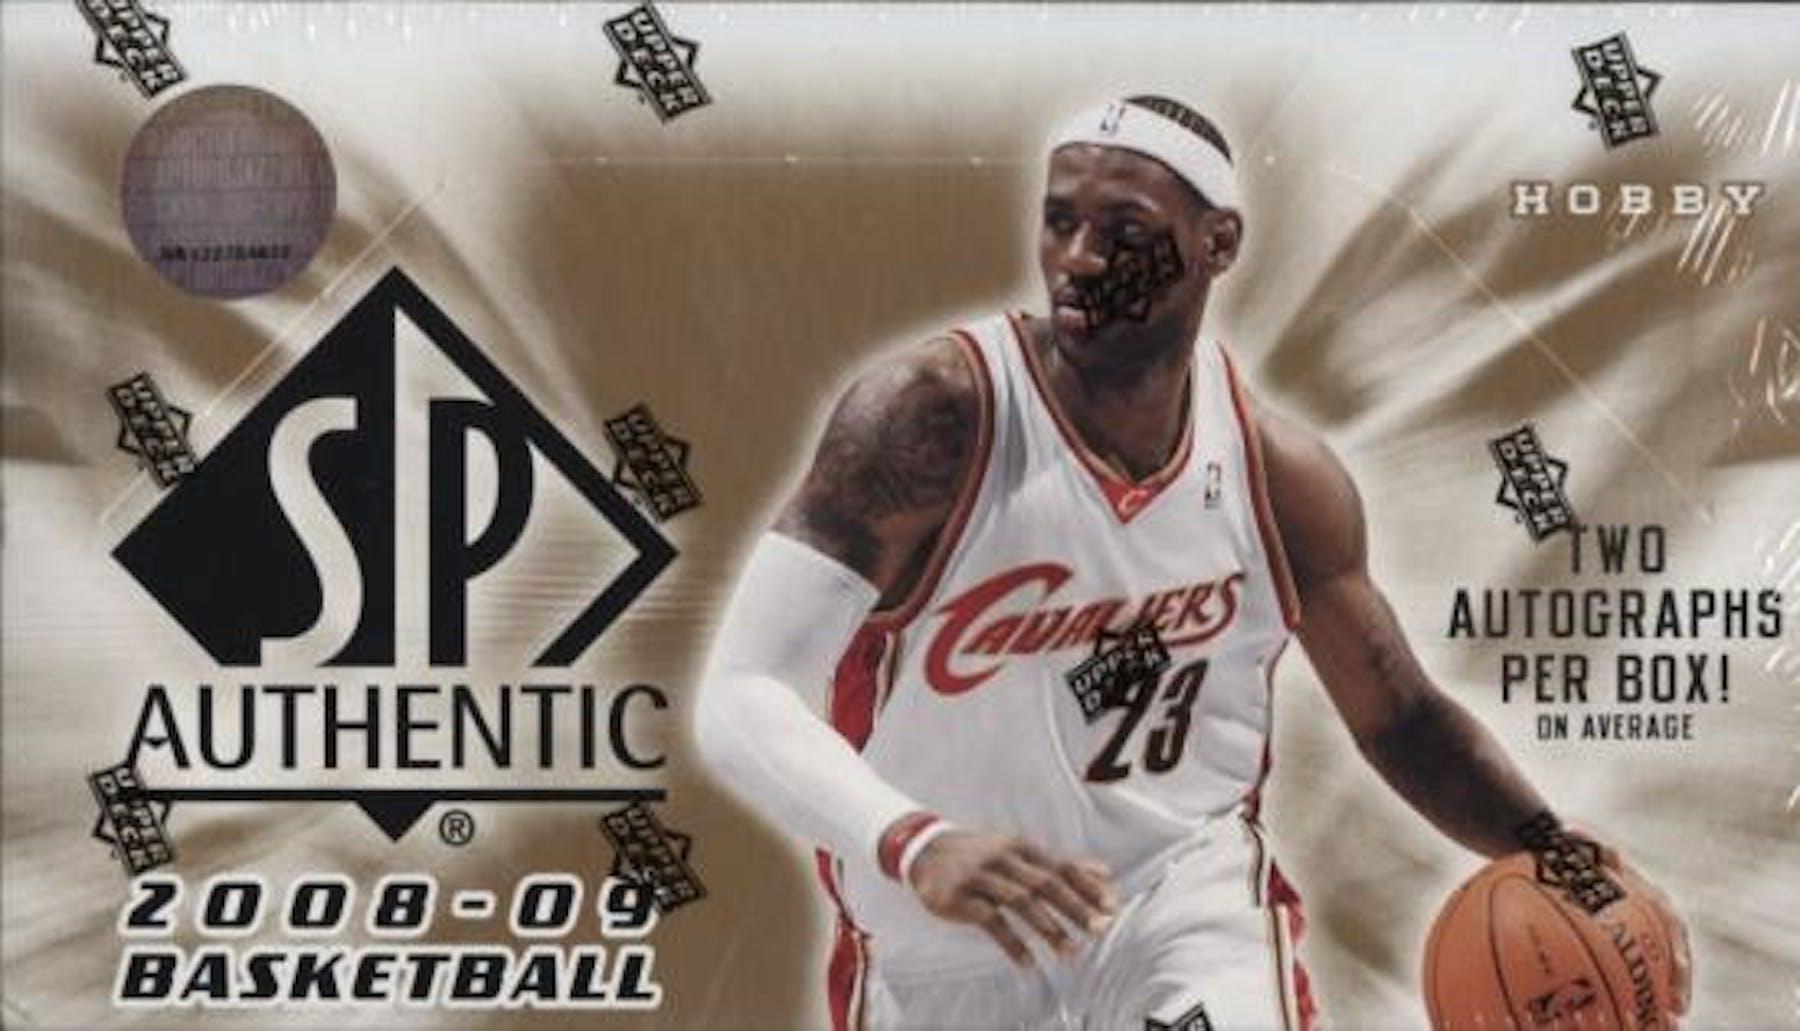 superior quality 3102e ace11 2008/09 Upper Deck SP Authentic Basketball Hobby Box